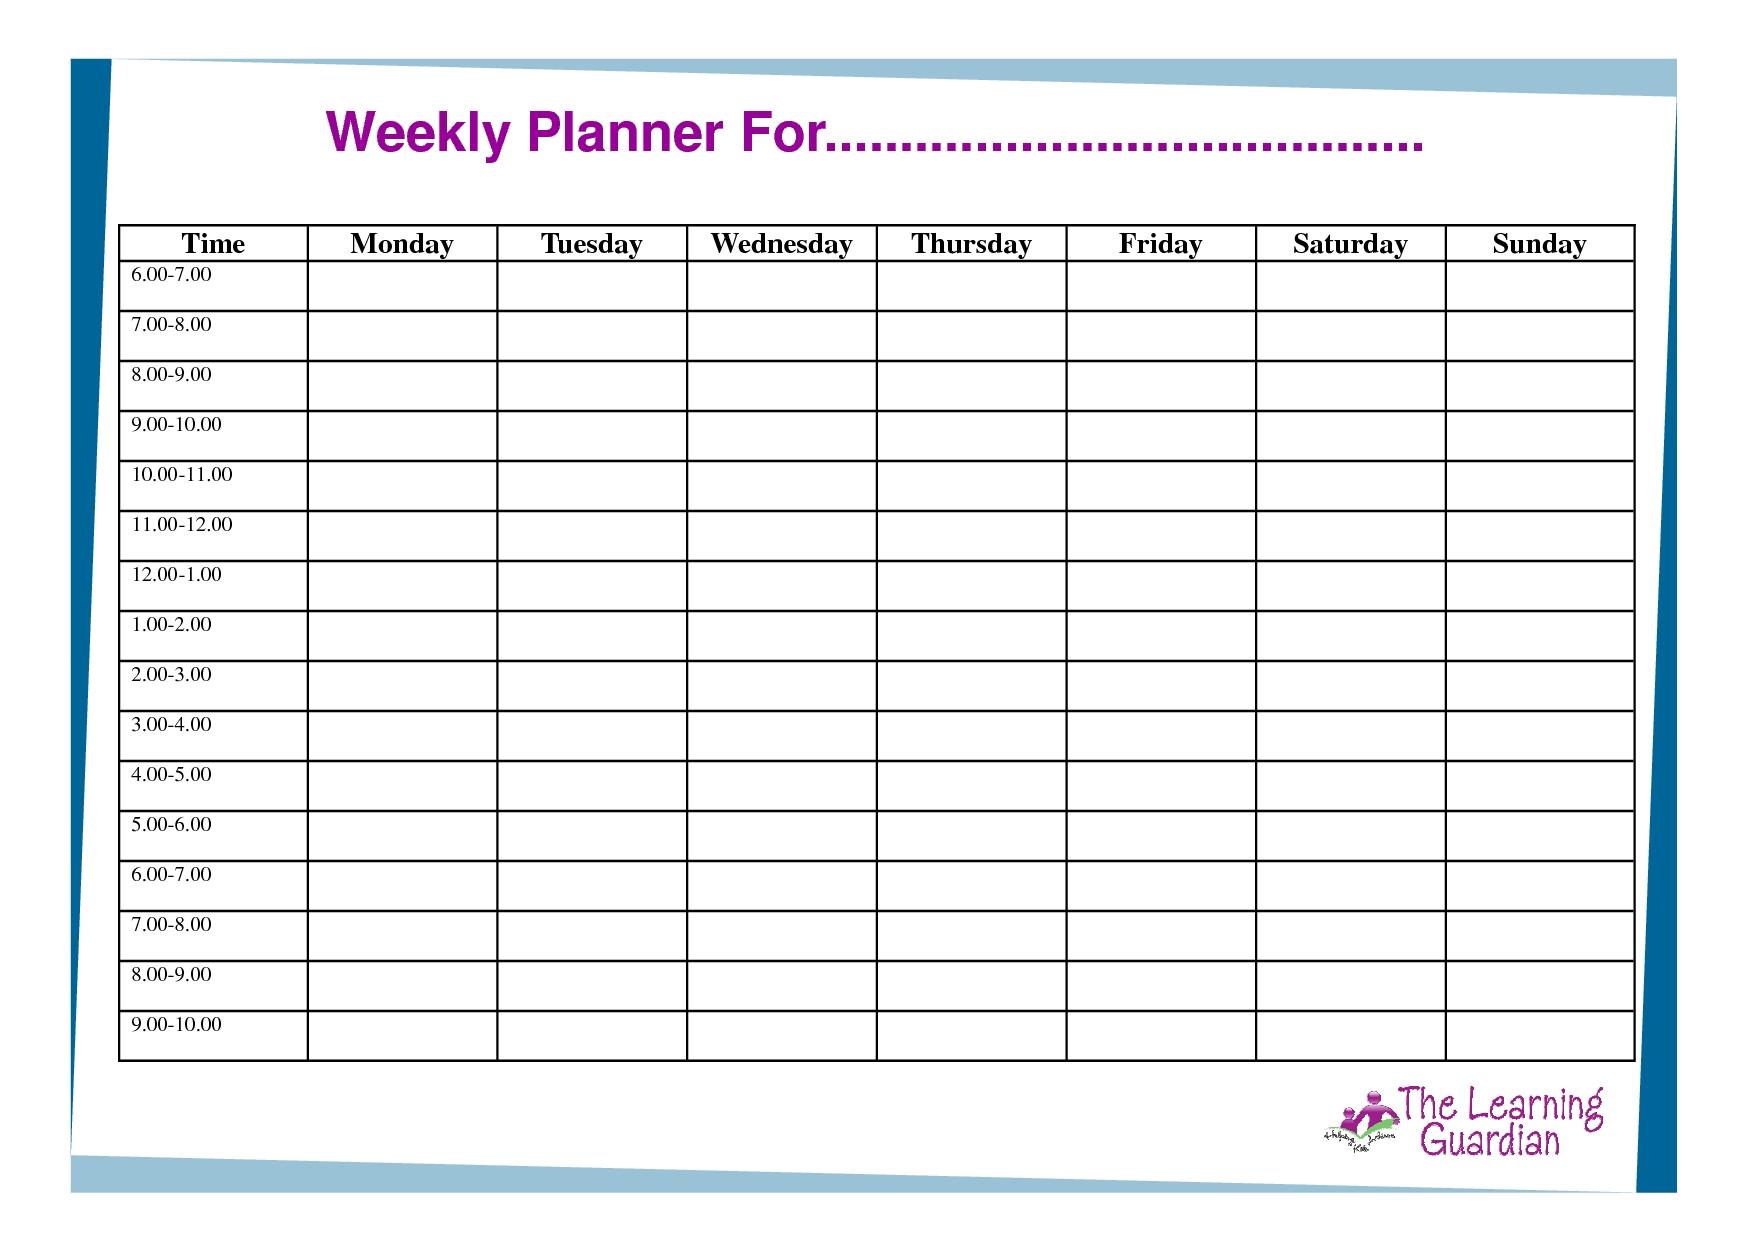 Printable Time Of Day Calendar  Calendar Inspiration Design for Free Printable Daily Calendar With Time Slots